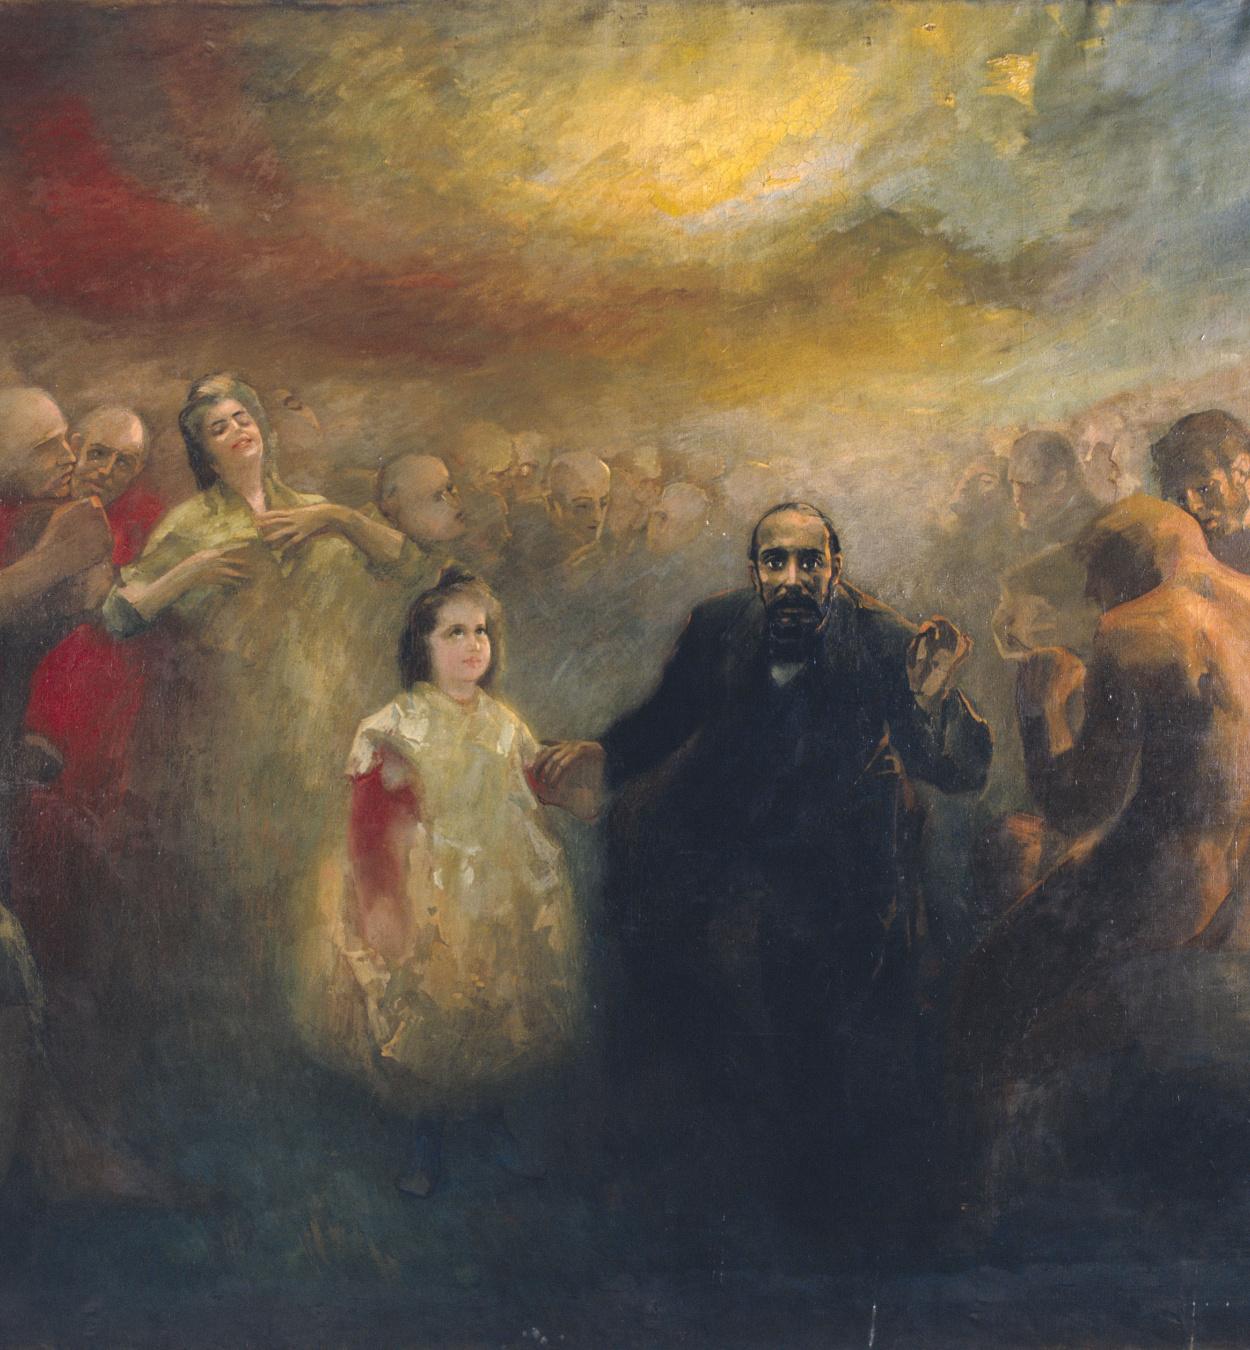 Aleix Clapés - Allegory of Doctor Robert - Circa 1890-1902